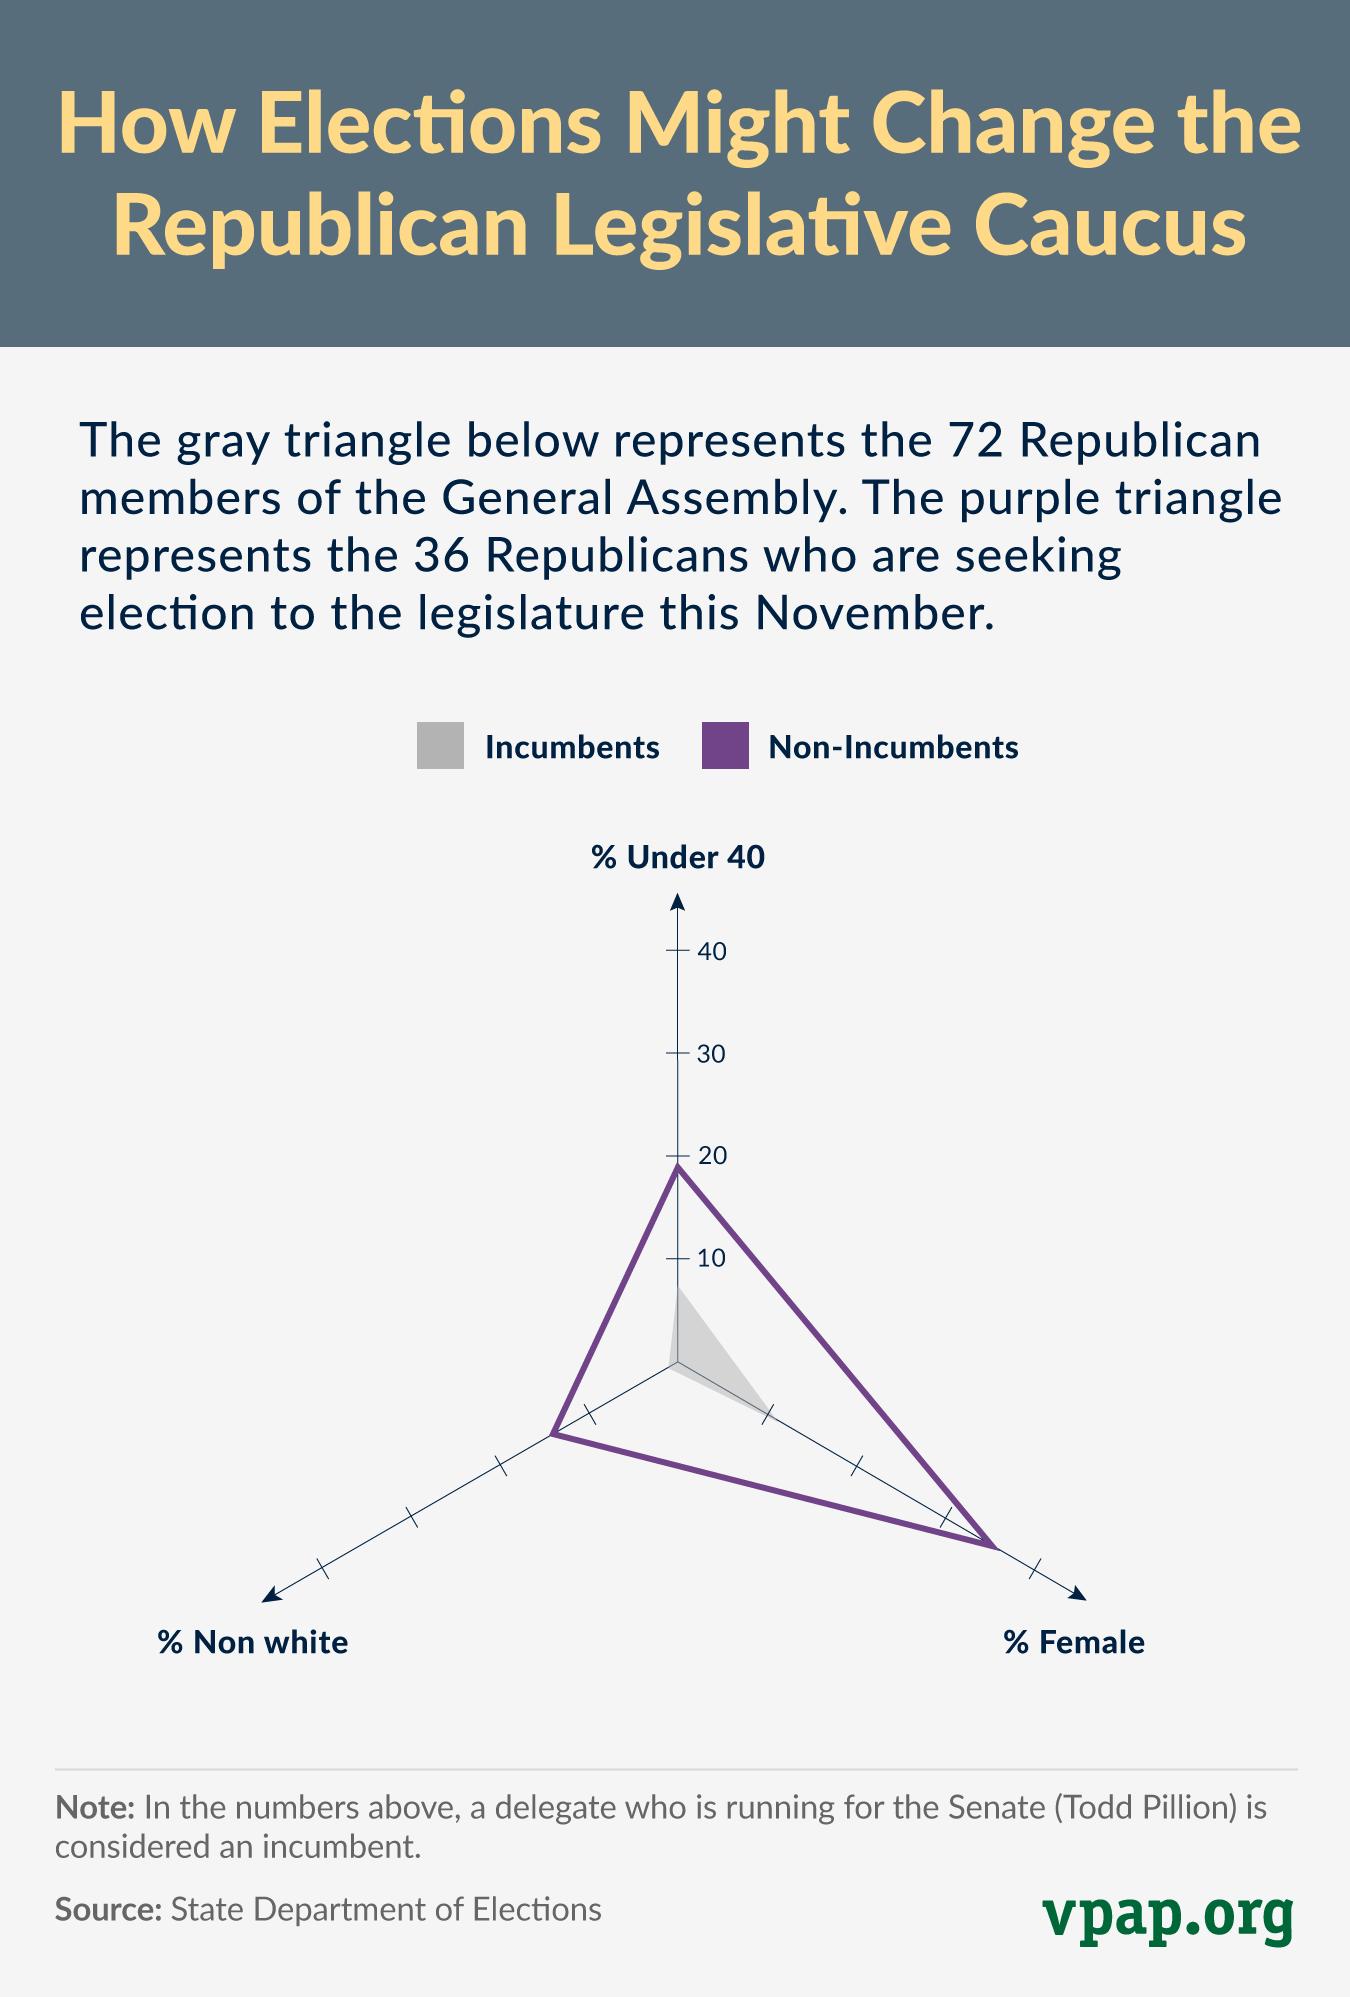 How Elections Might Change the Republican Legislative Caucus